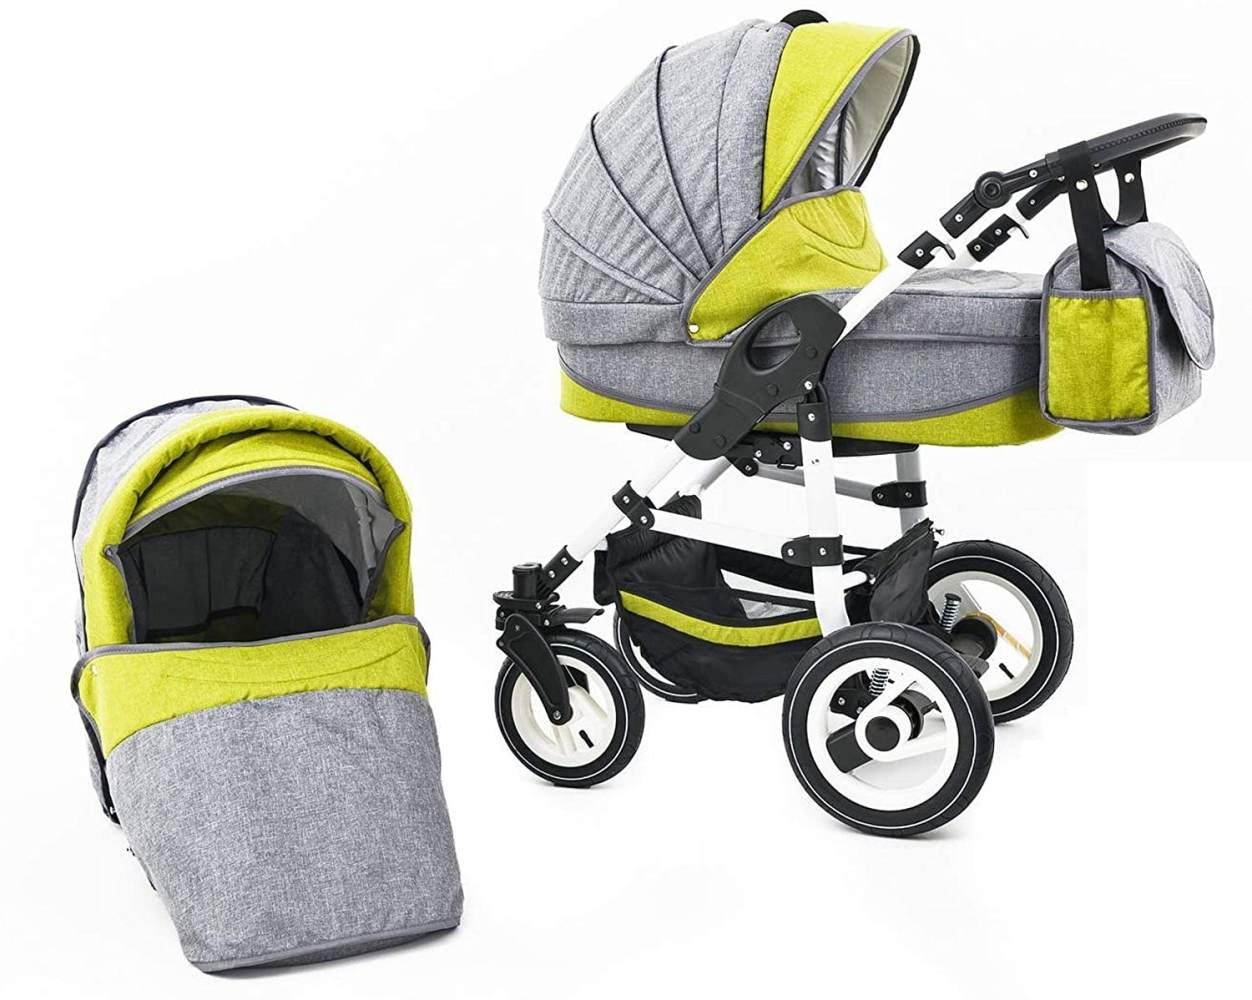 Tabbi ECO LN | 2 in 1 Kombi Kinderwagen | Hartgummireifen | Farbe: Green Bild 1